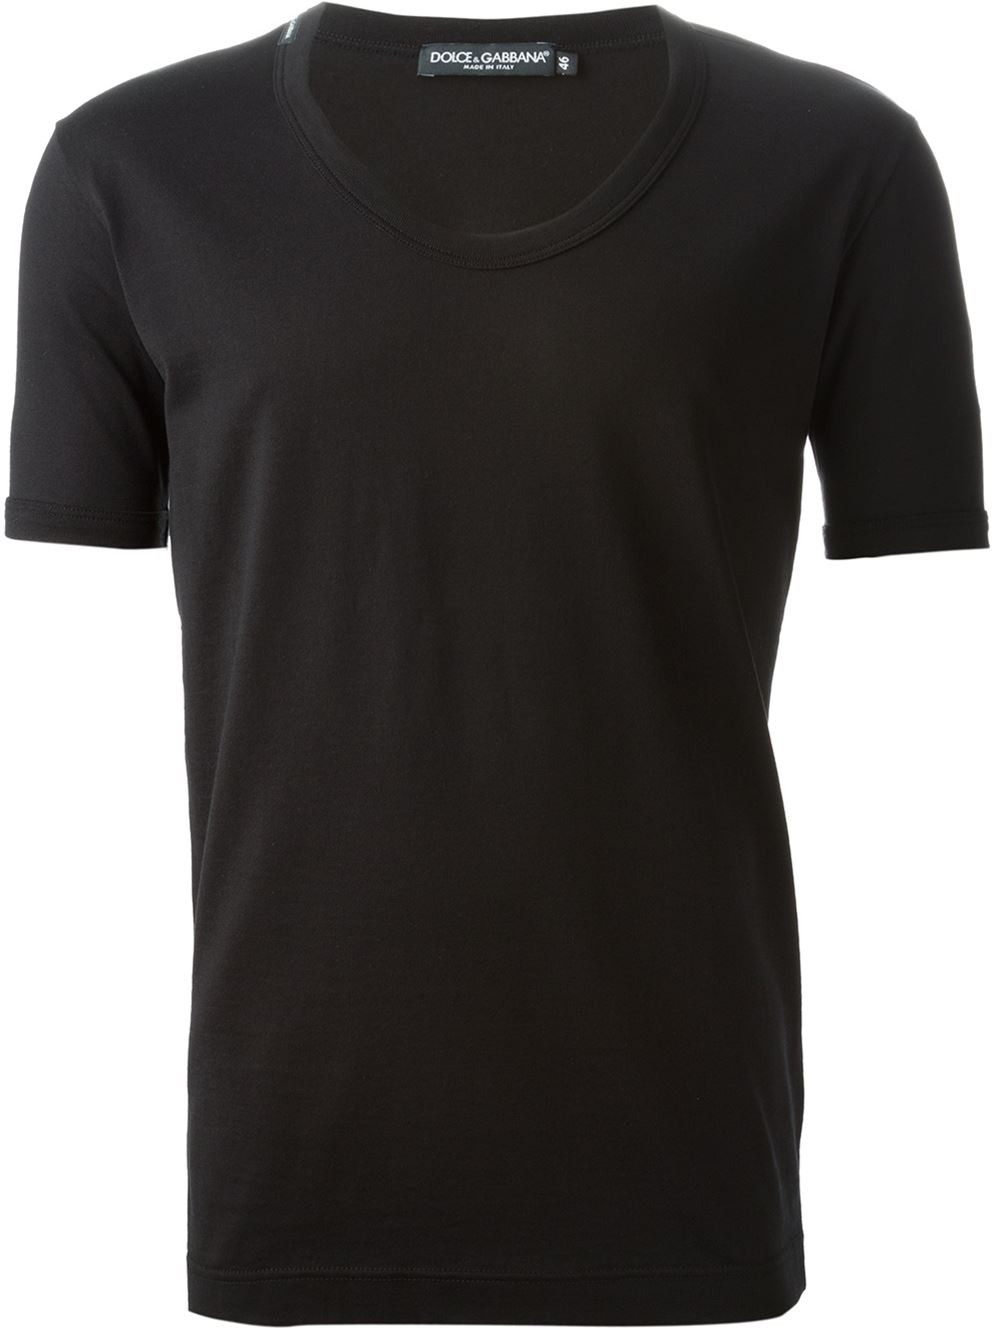 dolce gabbana classic t shirt in black for men lyst. Black Bedroom Furniture Sets. Home Design Ideas